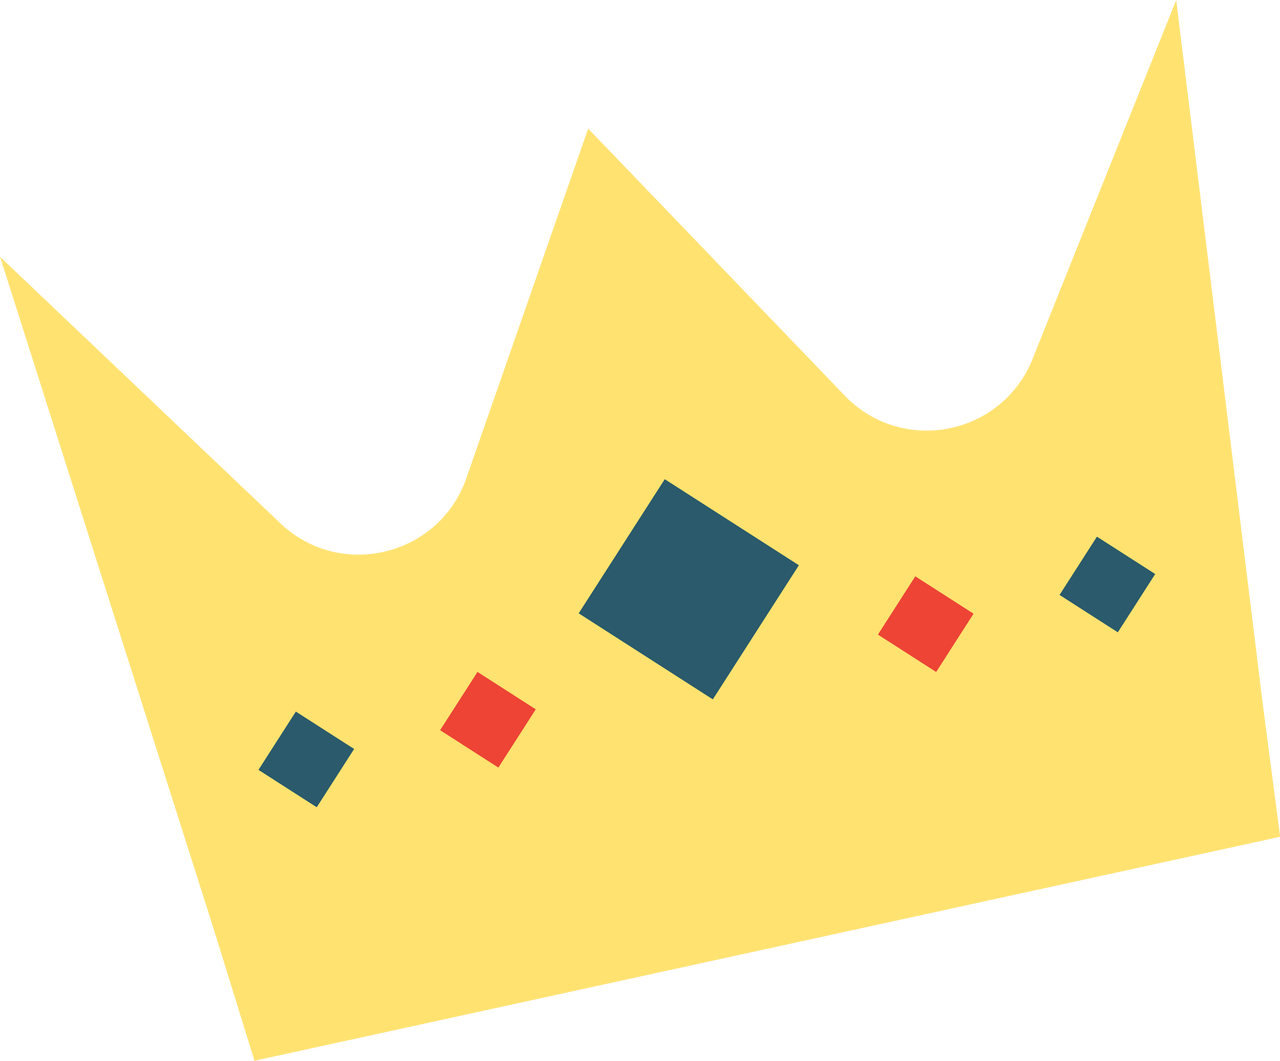 Birthday Crown SVG Cut File